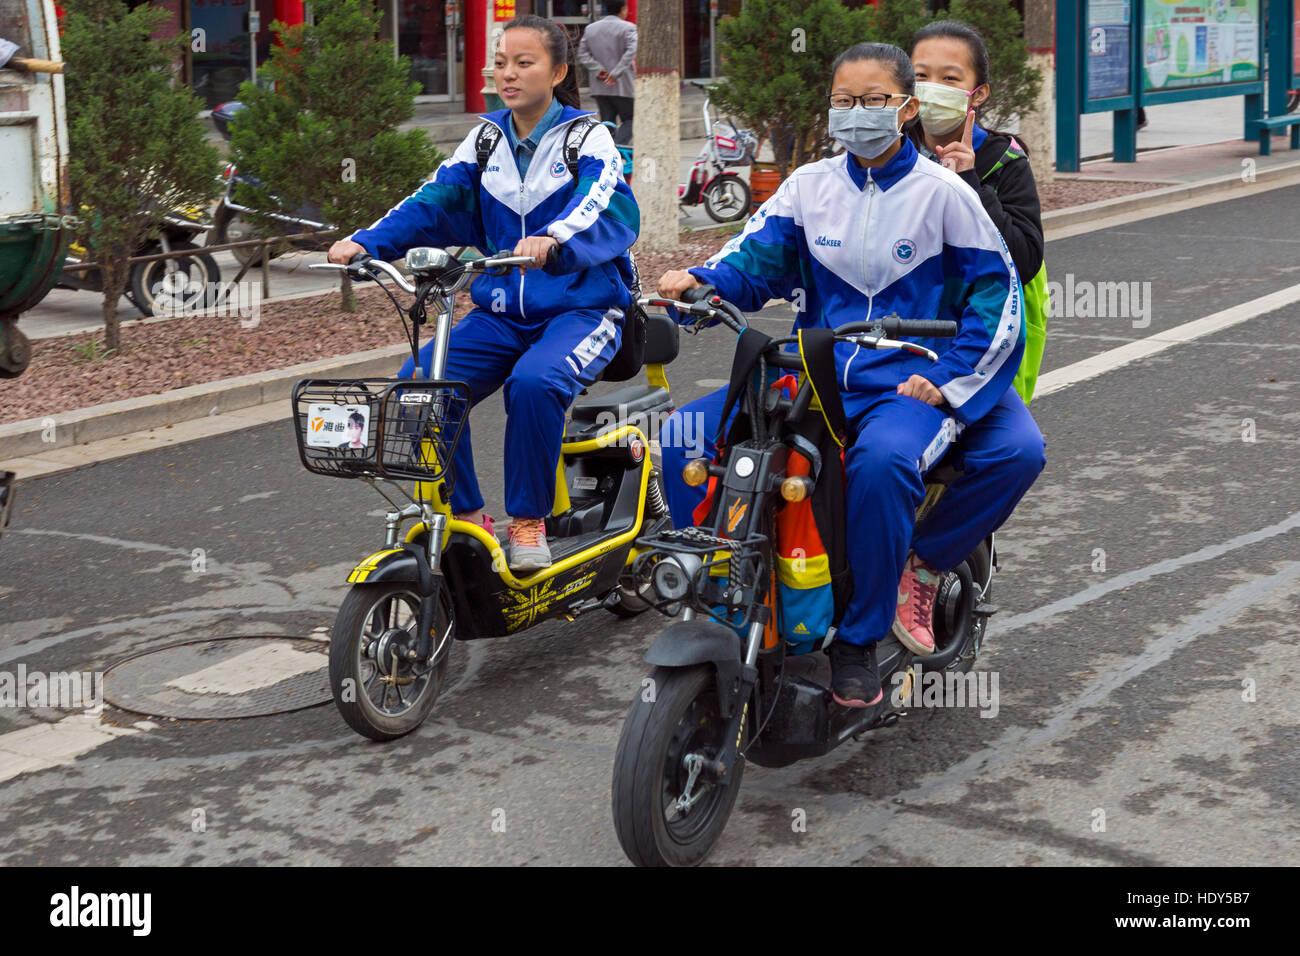 Schoolgirls on bikes, Zhongwei, Ningxia, China - Stock Image